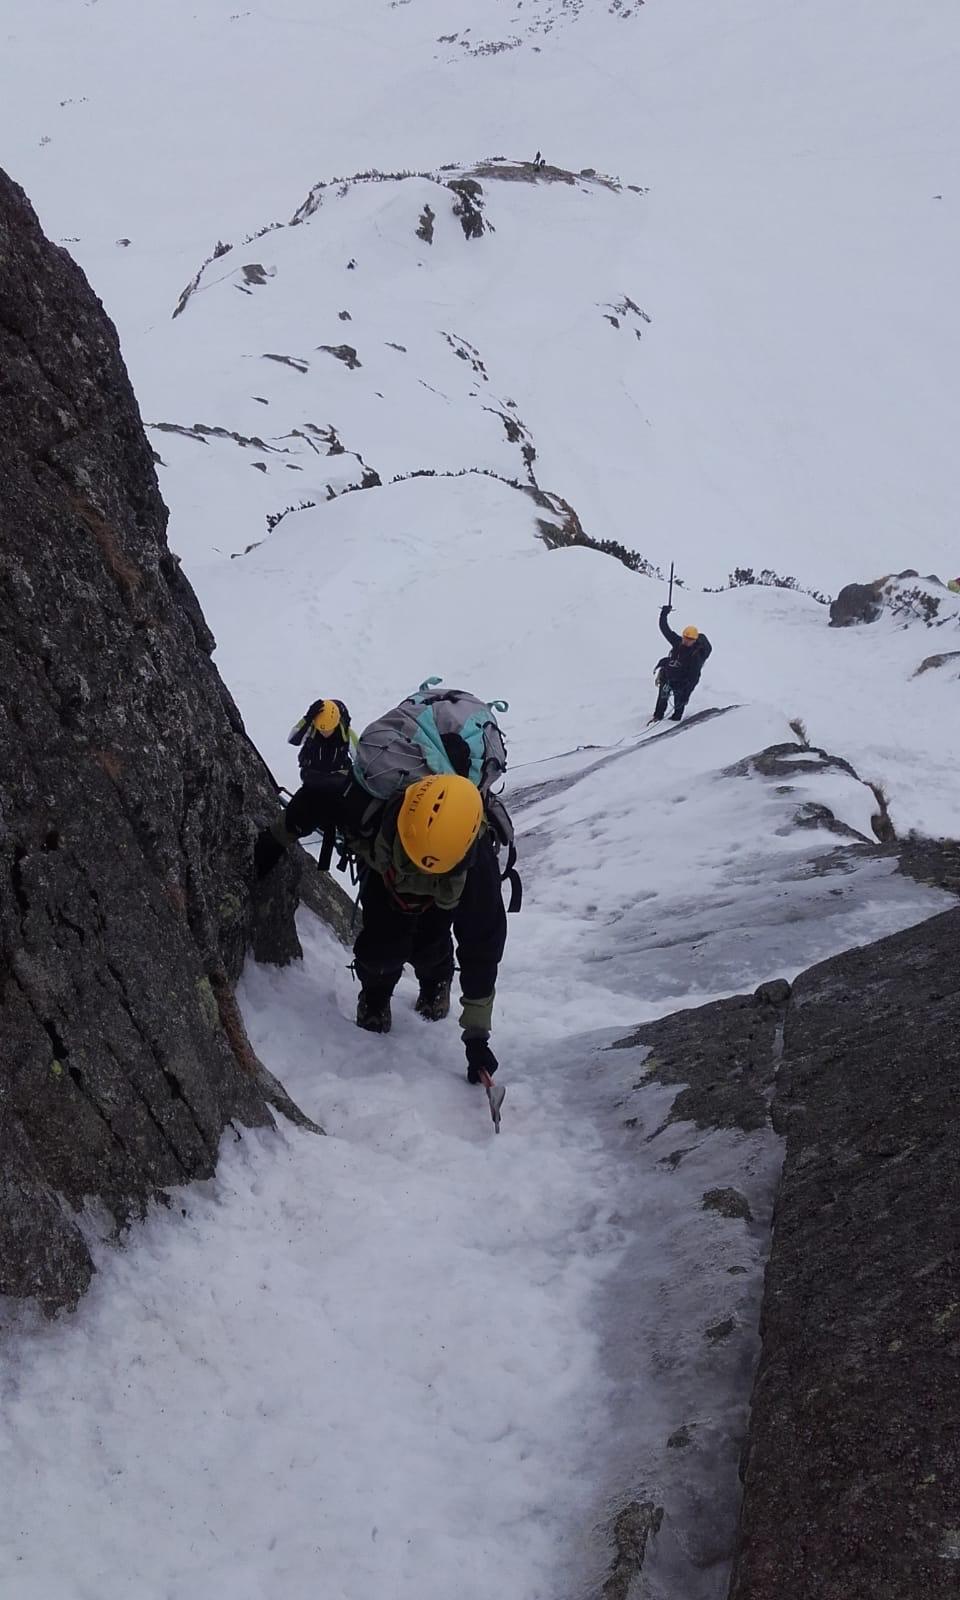 lód - wspinaczka górska